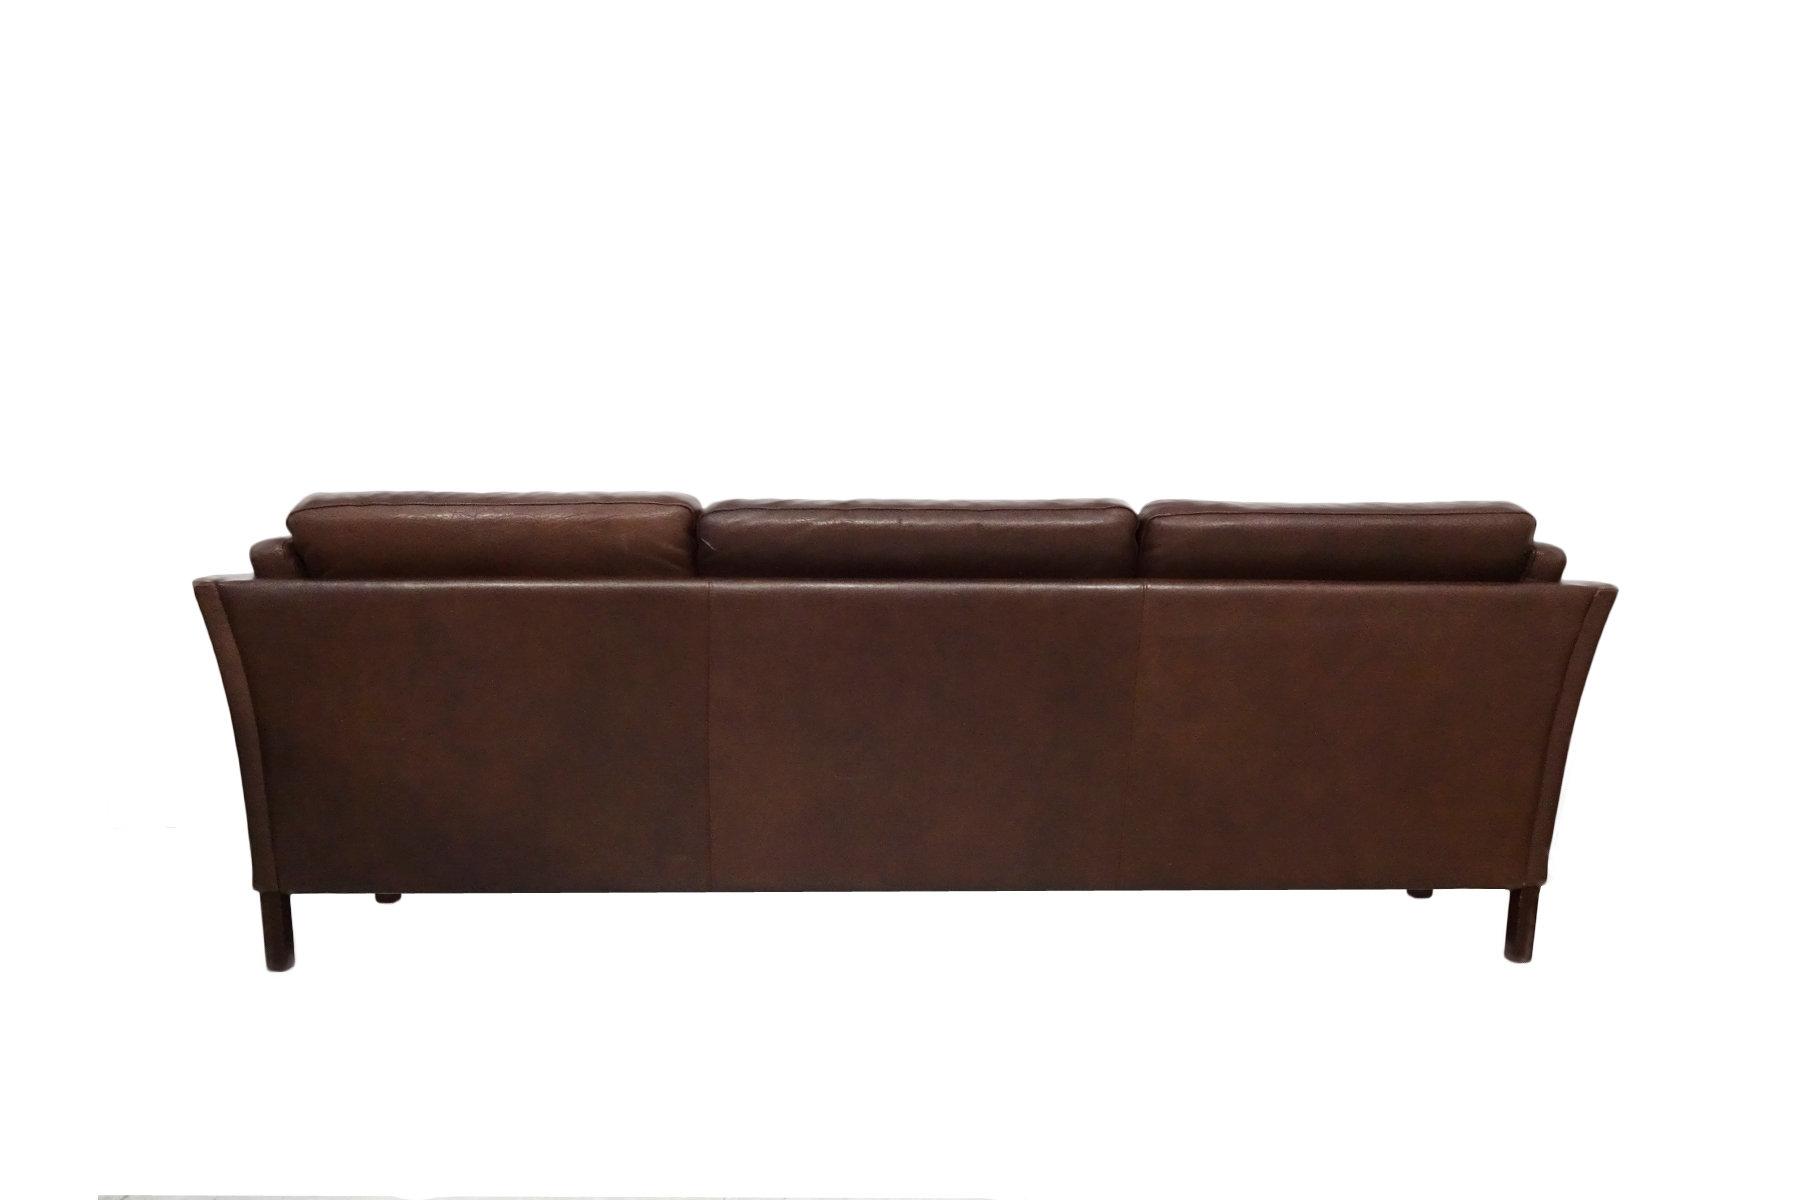 Danish Mid Century Sofa By Mogens Hansen